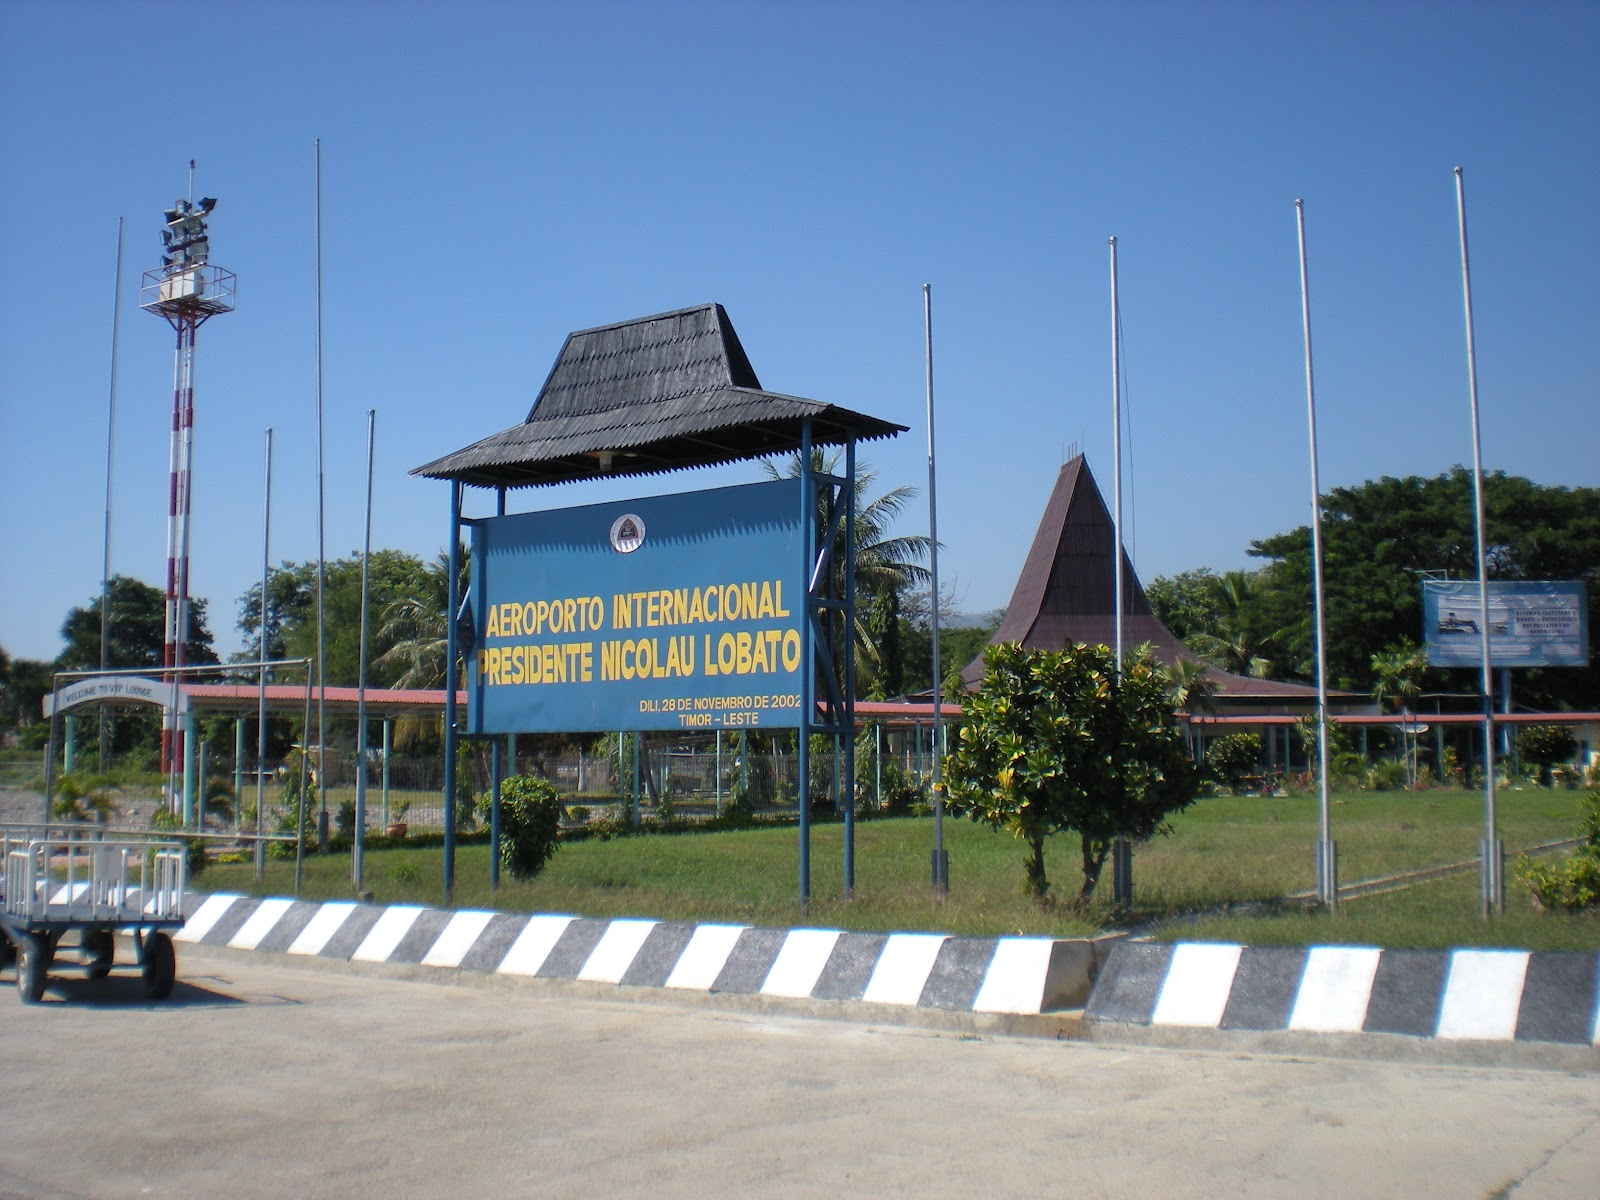 Aeroporto Dili : Timor leste sydneyisms: ruminations from an american girl in sydney